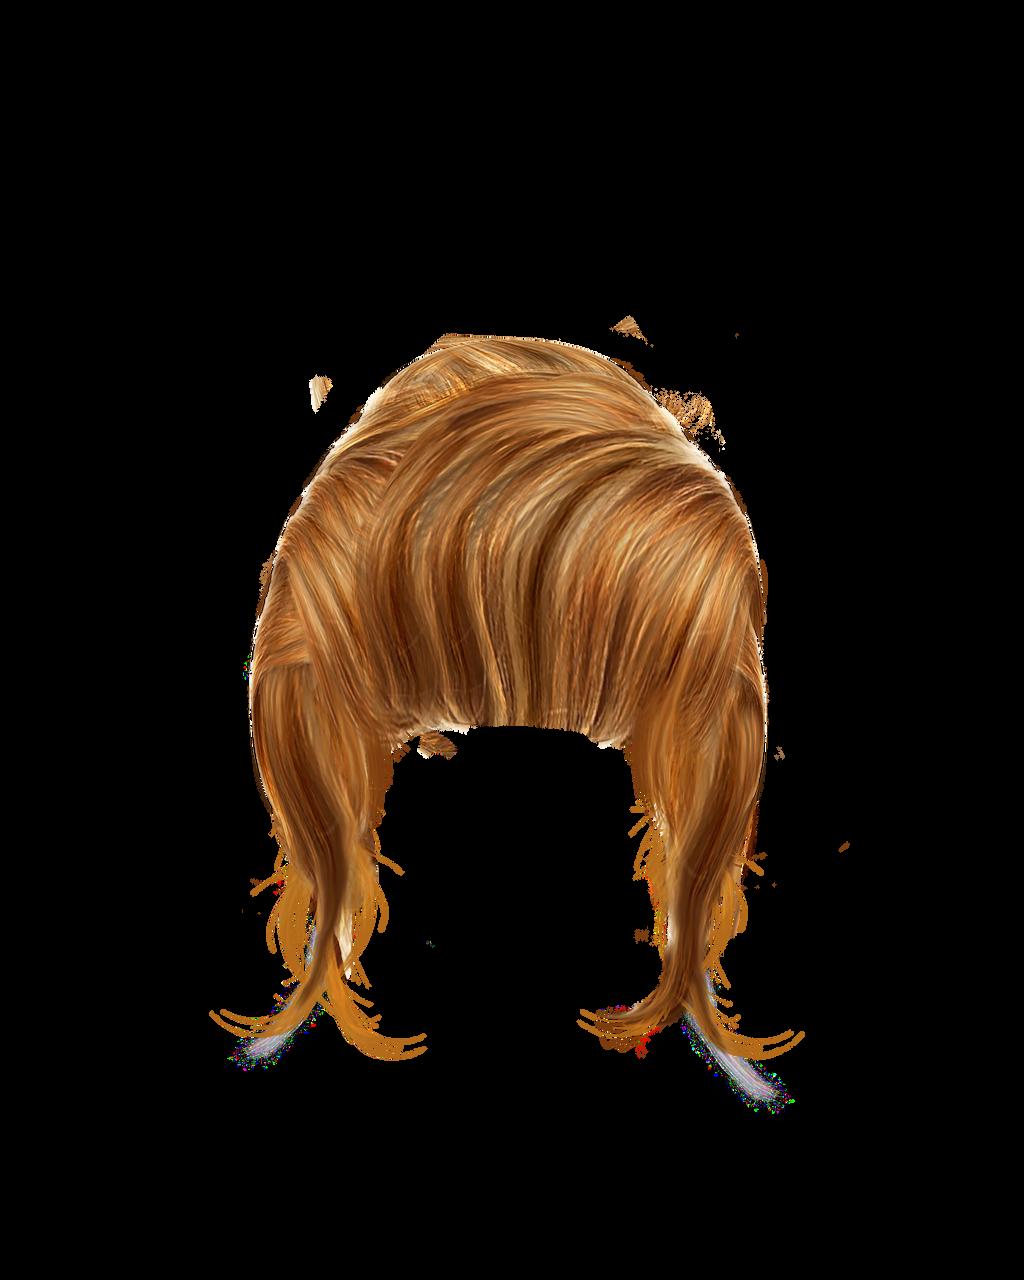 hair png - photo #3